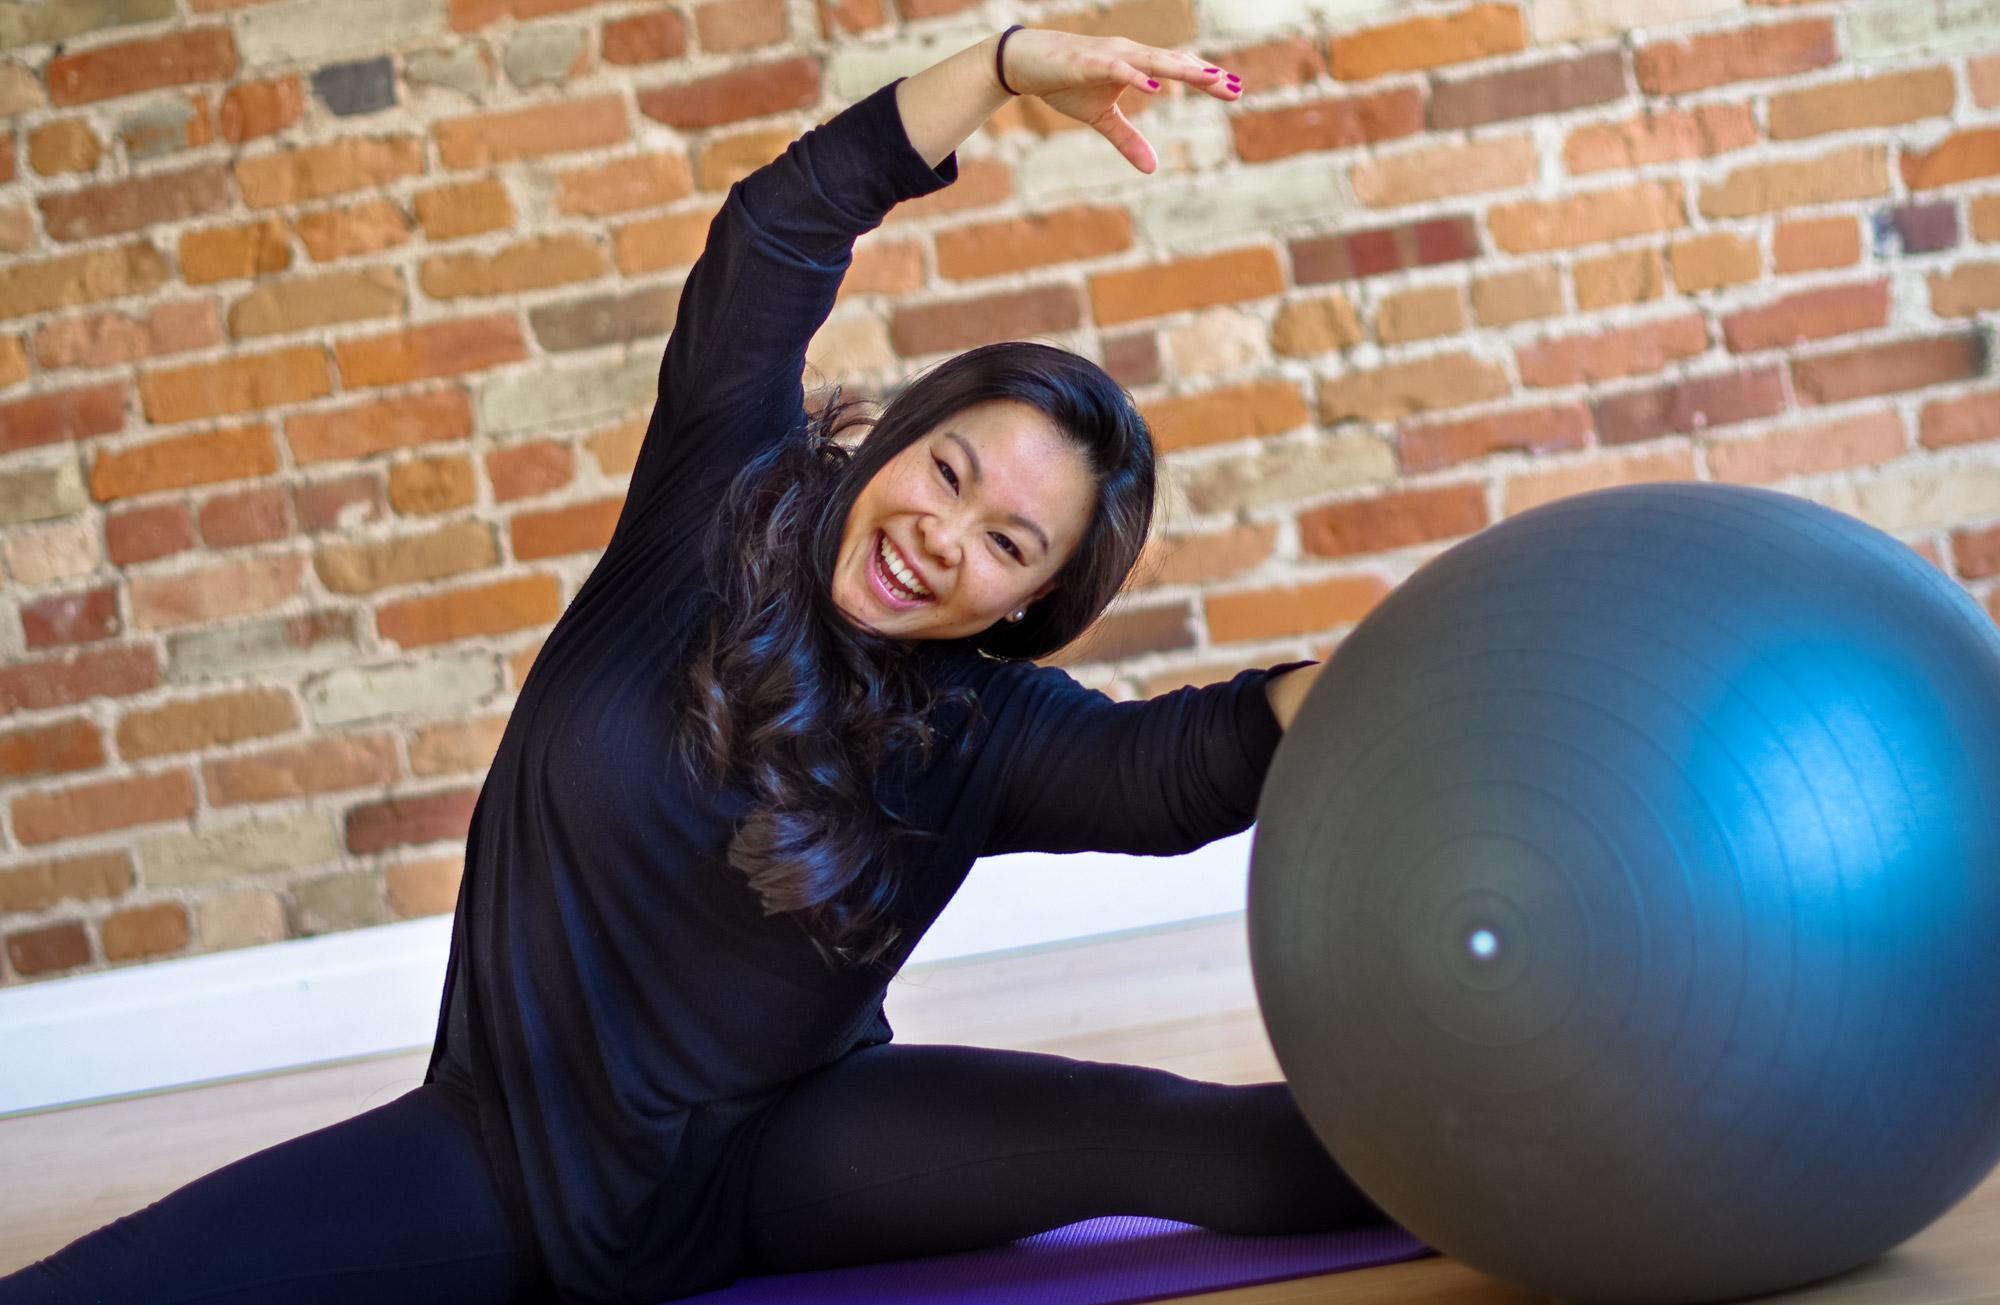 Pilates instructor posing